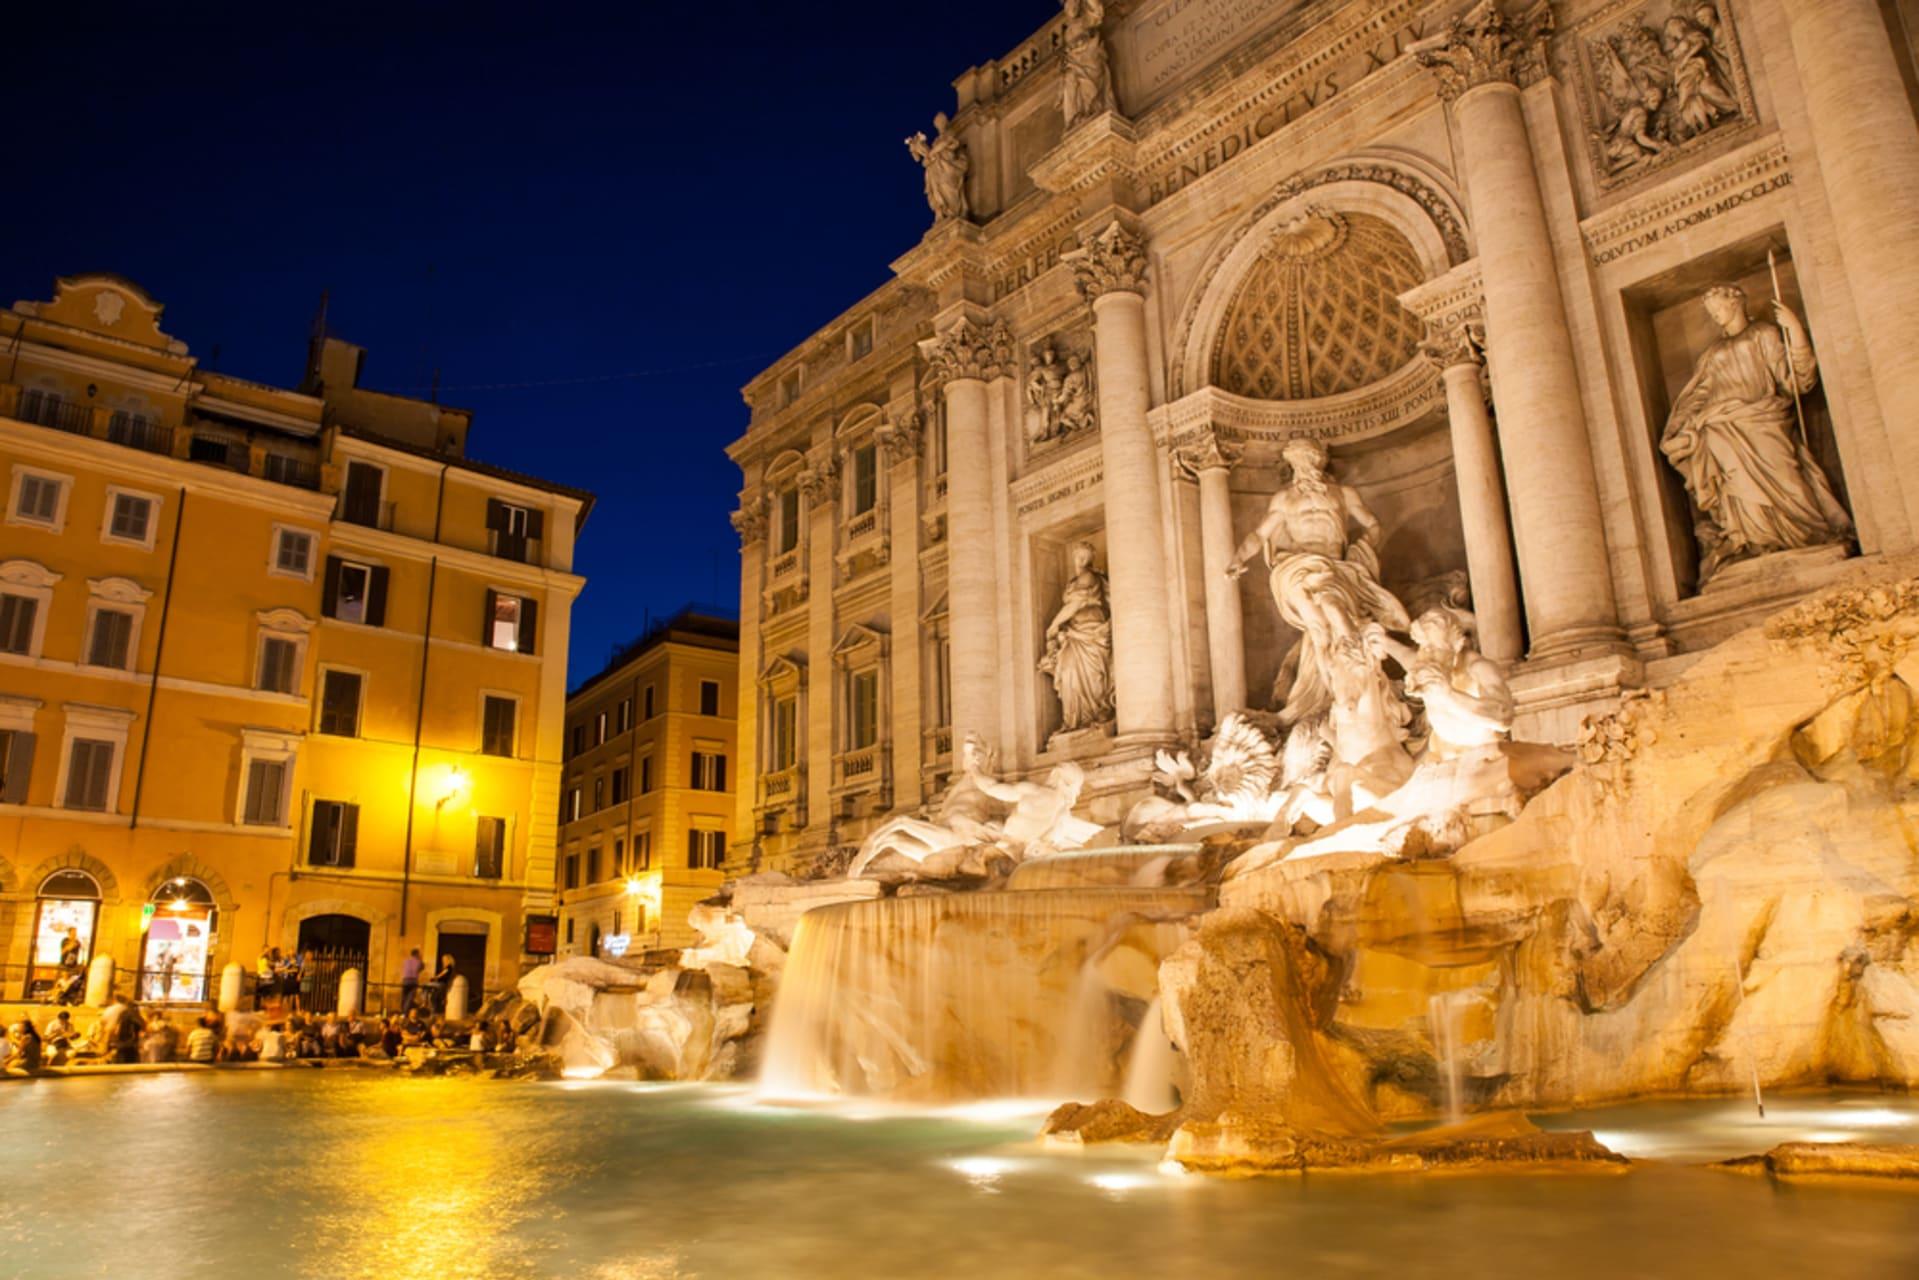 Rome - Rome - Where will we go tonight?